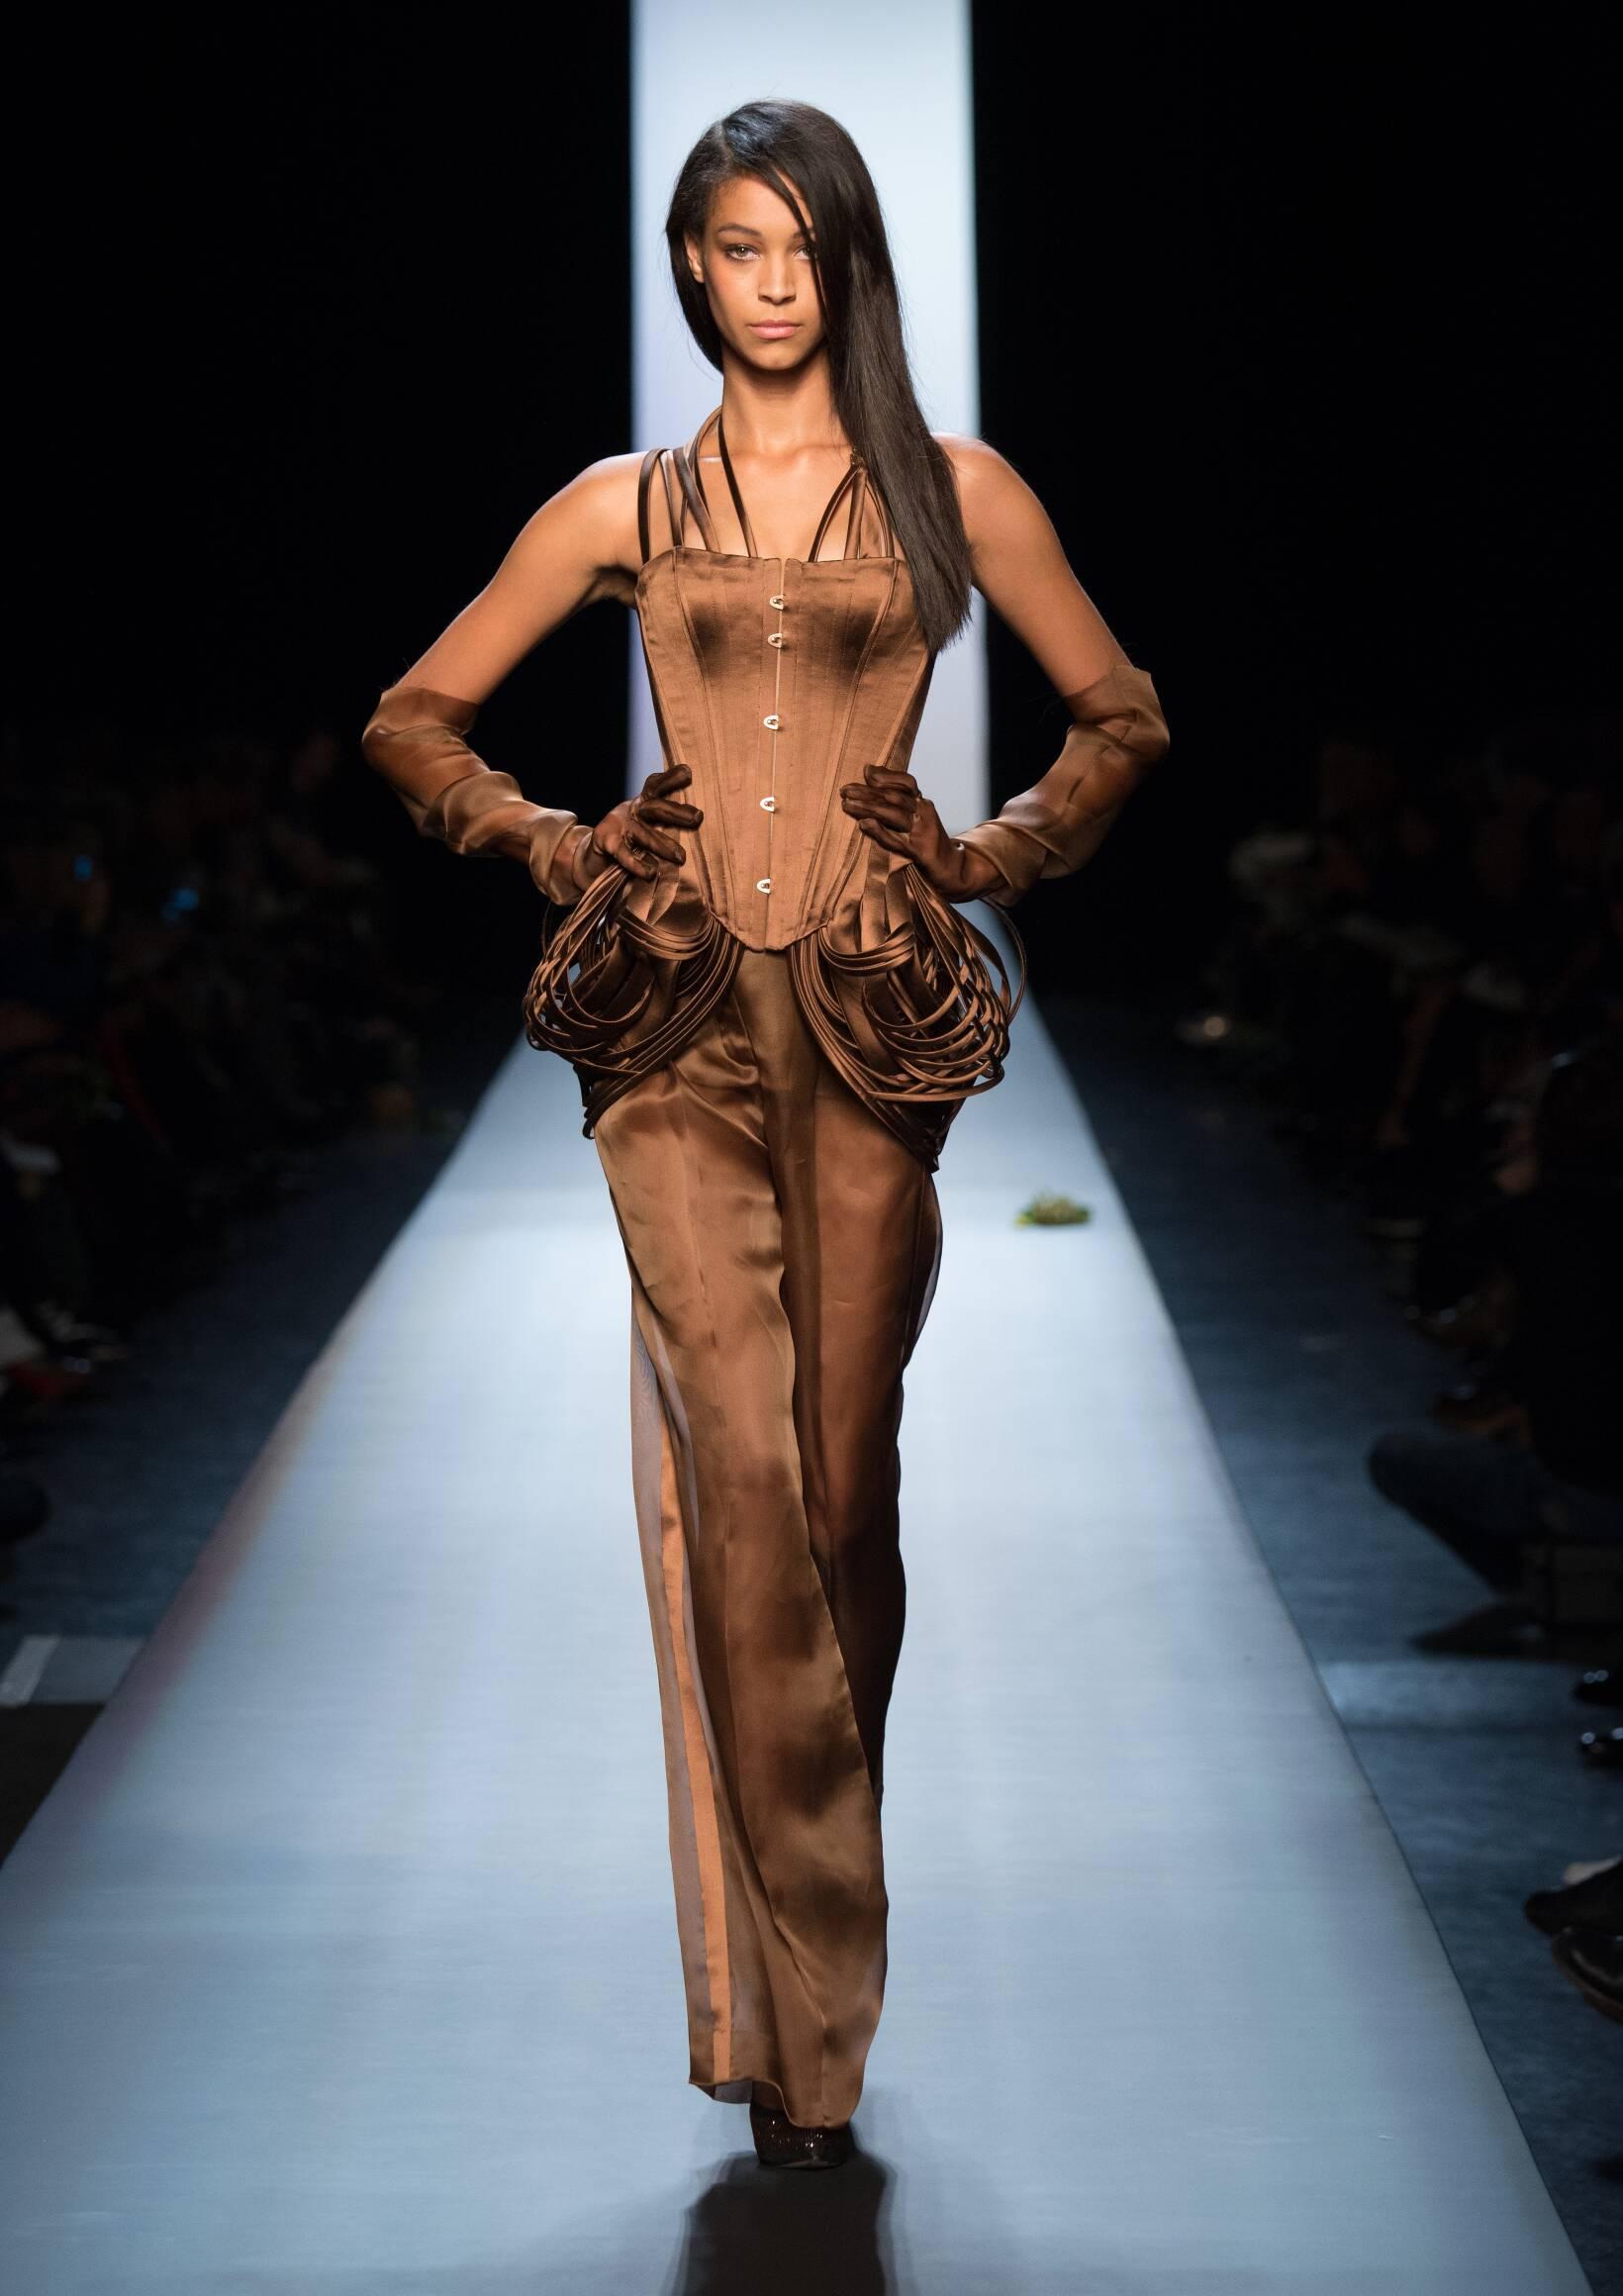 2015 Catwalk Jean Paul Gaultier Haute Couture Collection Fashion Show Summer